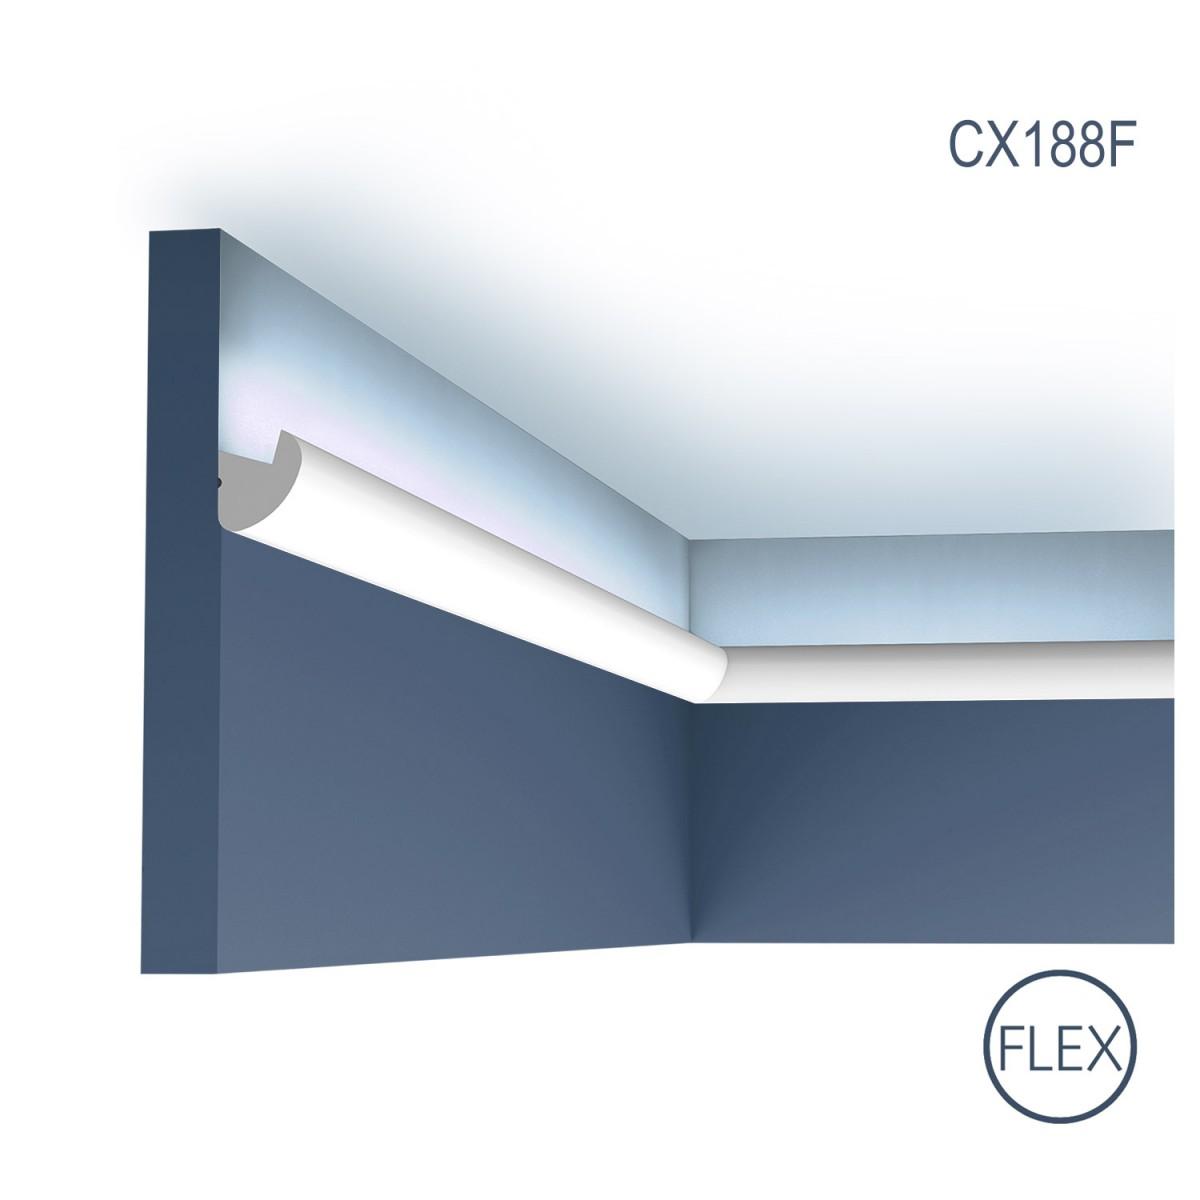 Cornisa Flex Axxent CX188F, Dimensiuni: 200 X 3 X 3.4 cm, Orac Decor